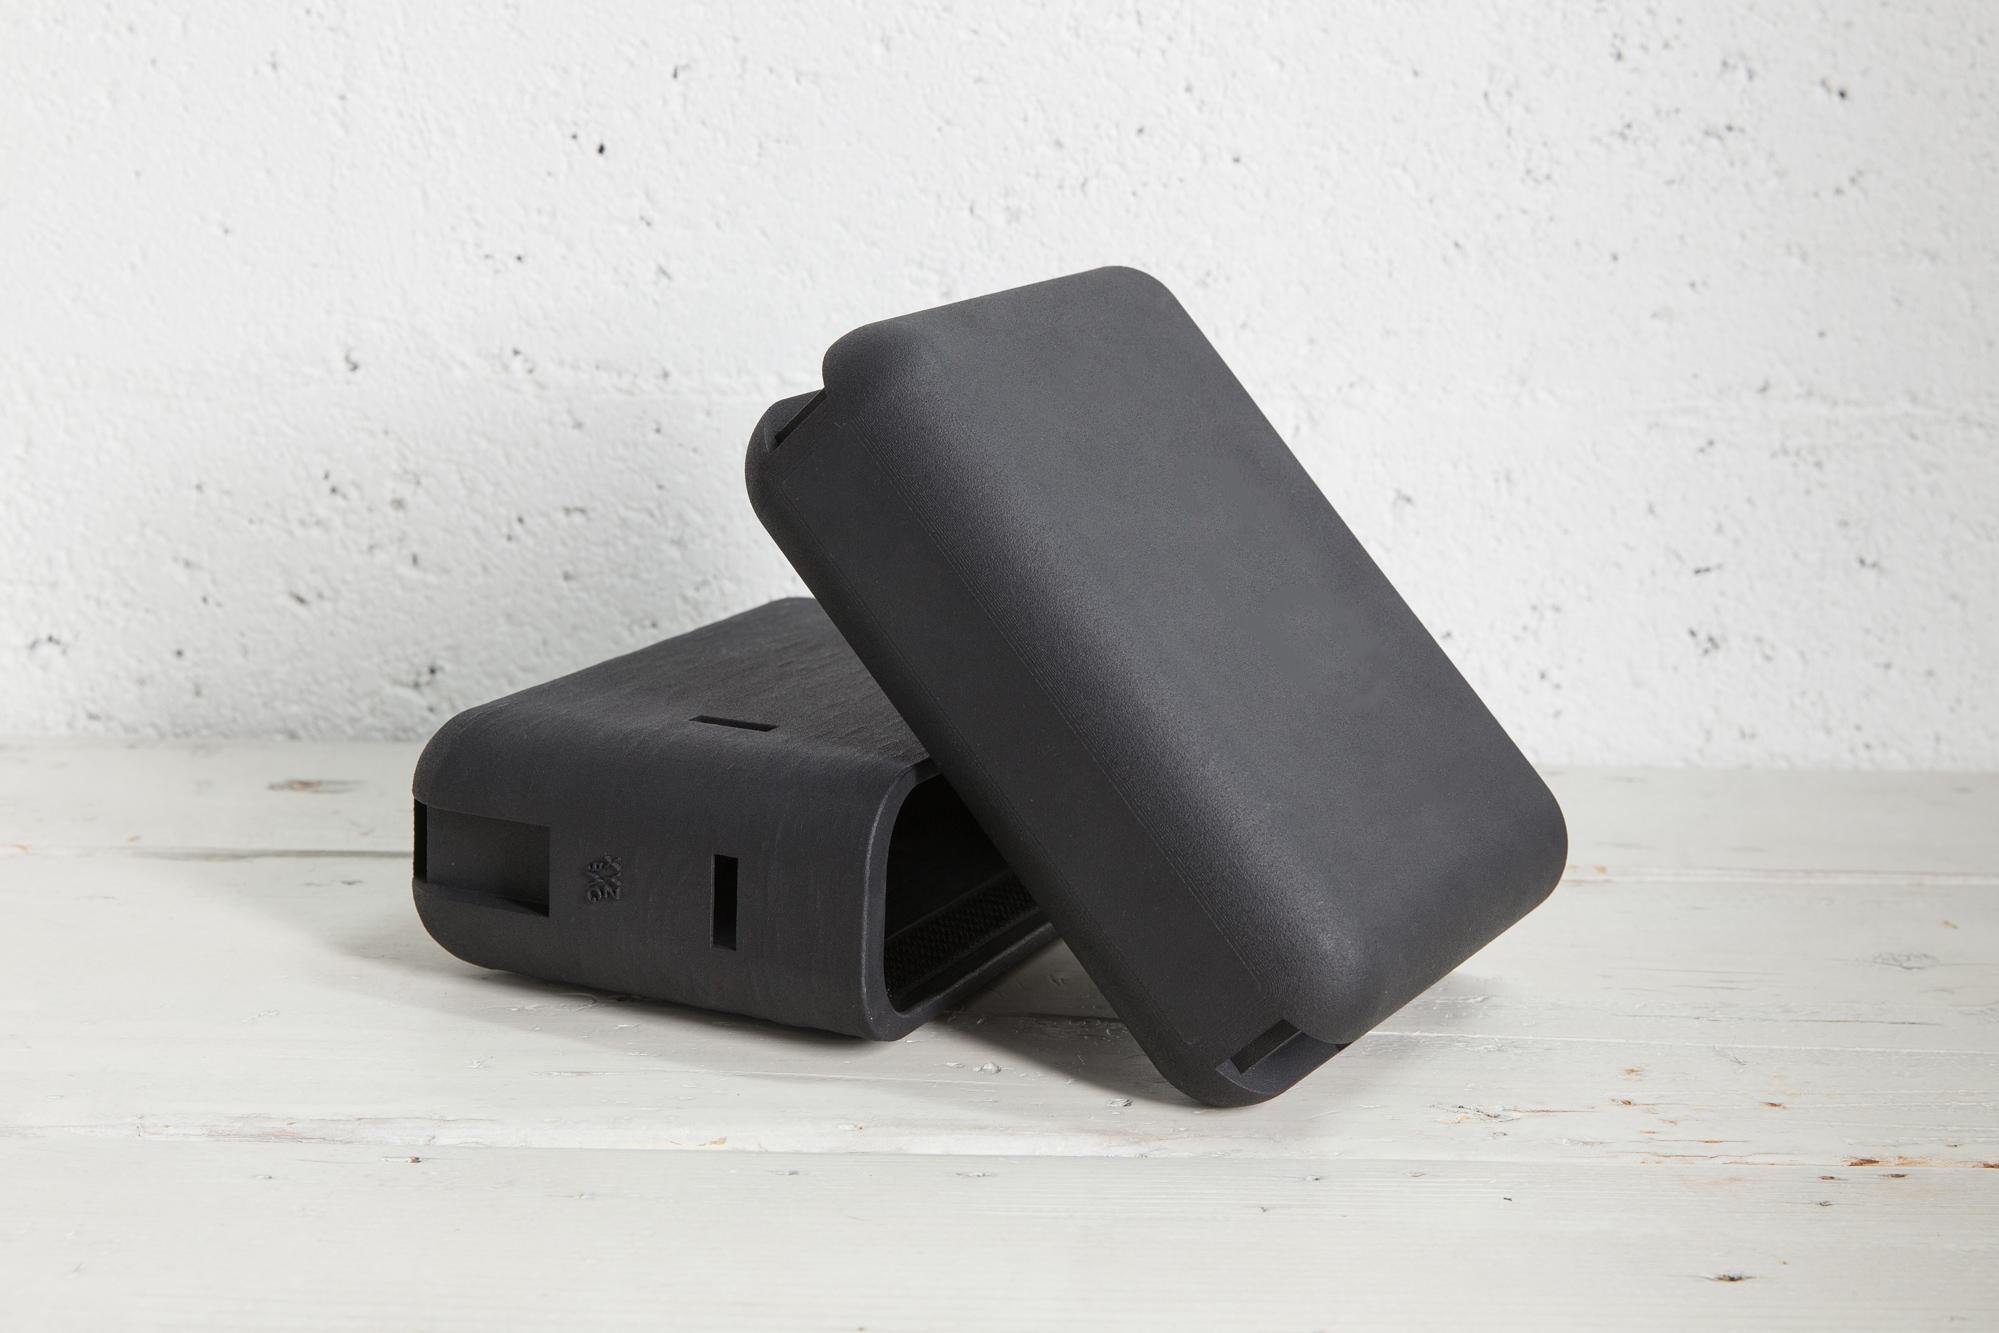 XYZBag. 3D handbags designed as unique items, through a co-created digital sartorial manufacturing process.